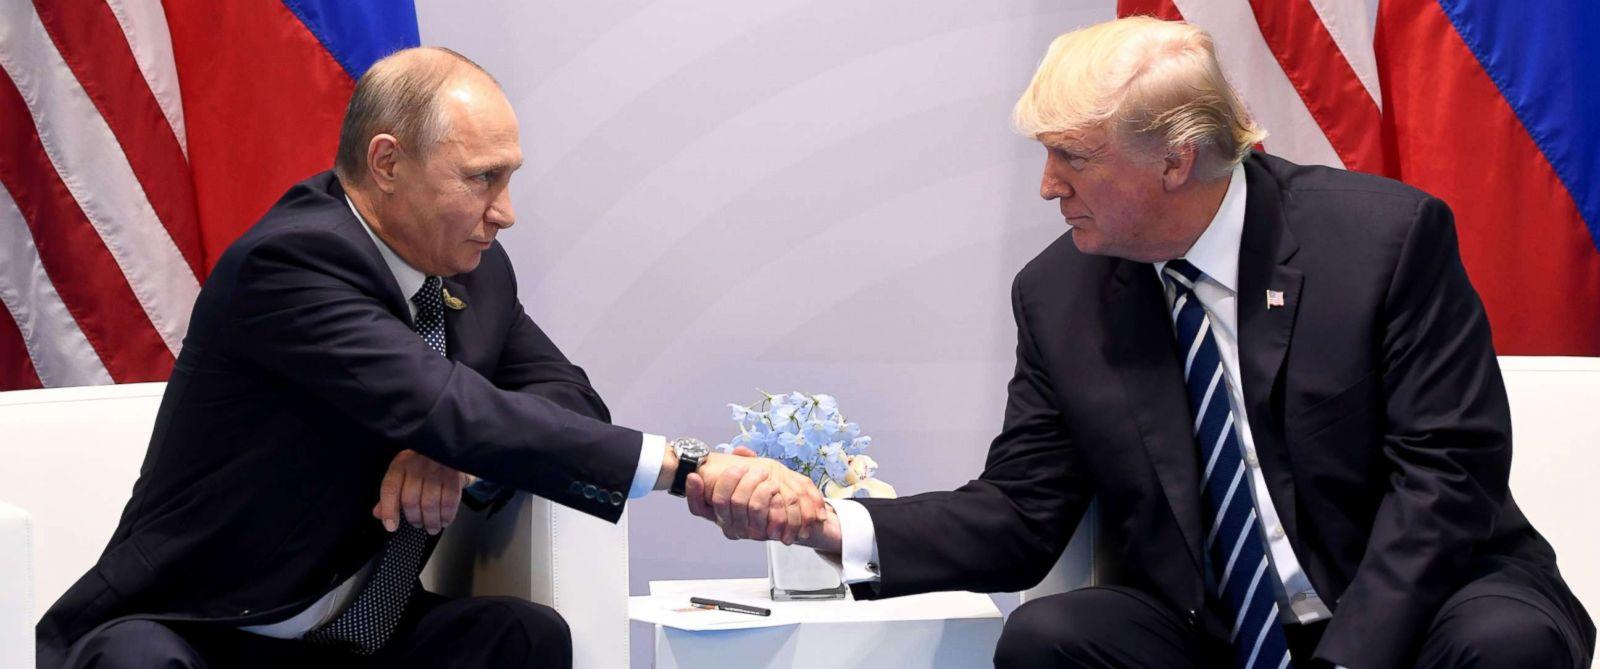 BREAKING: Putin and Trump make public statement